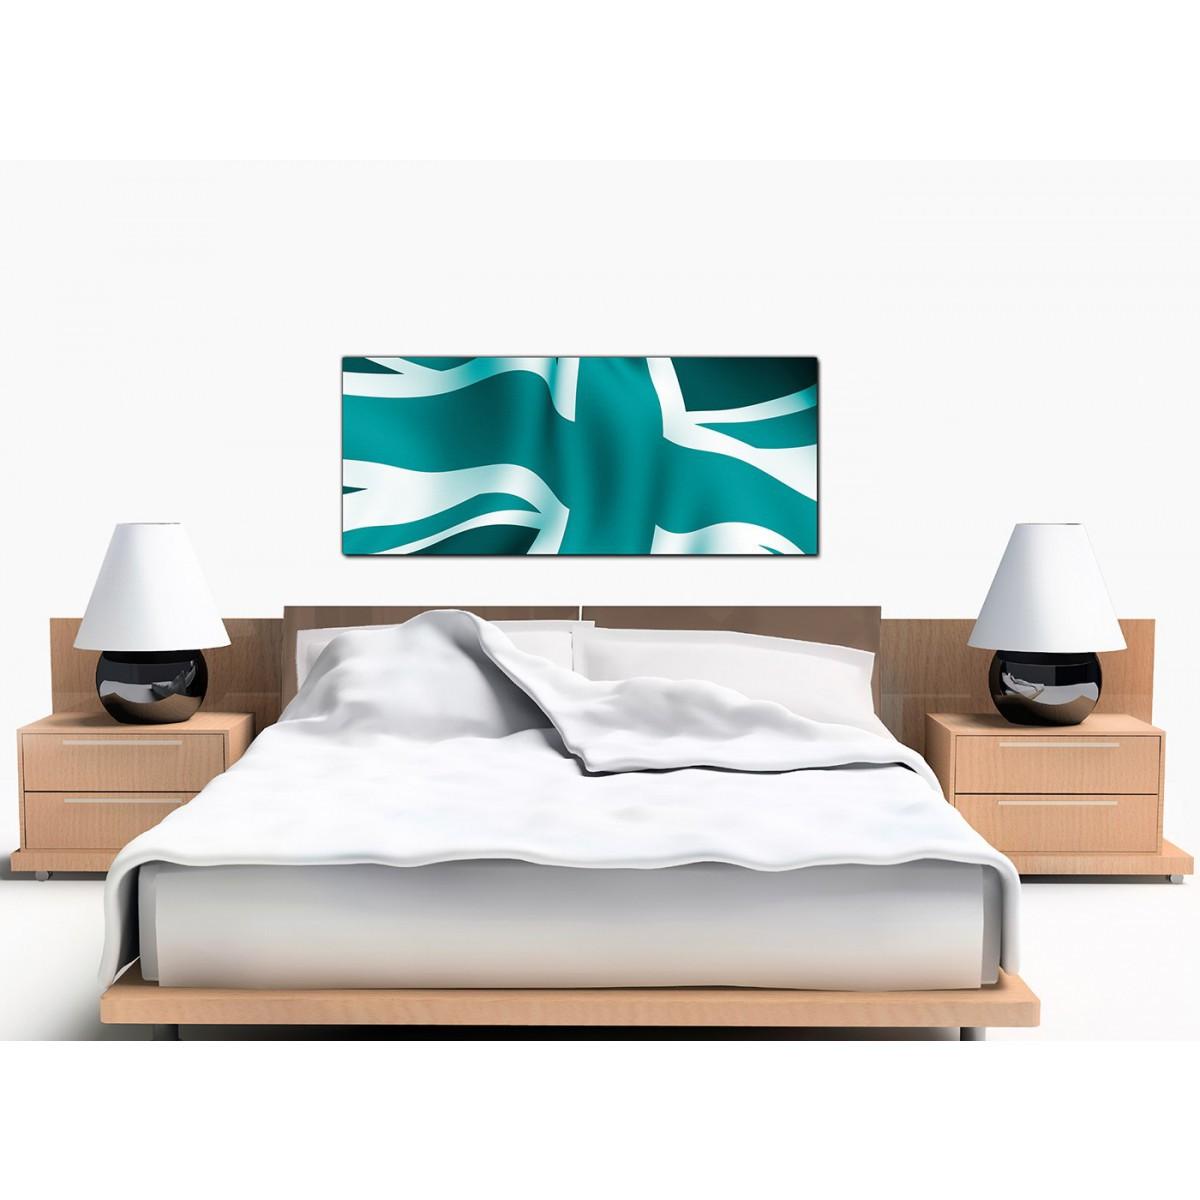 Display Gallery Item 3; British Flag Large Teal Canvas Wall Art Display  Gallery Item 4